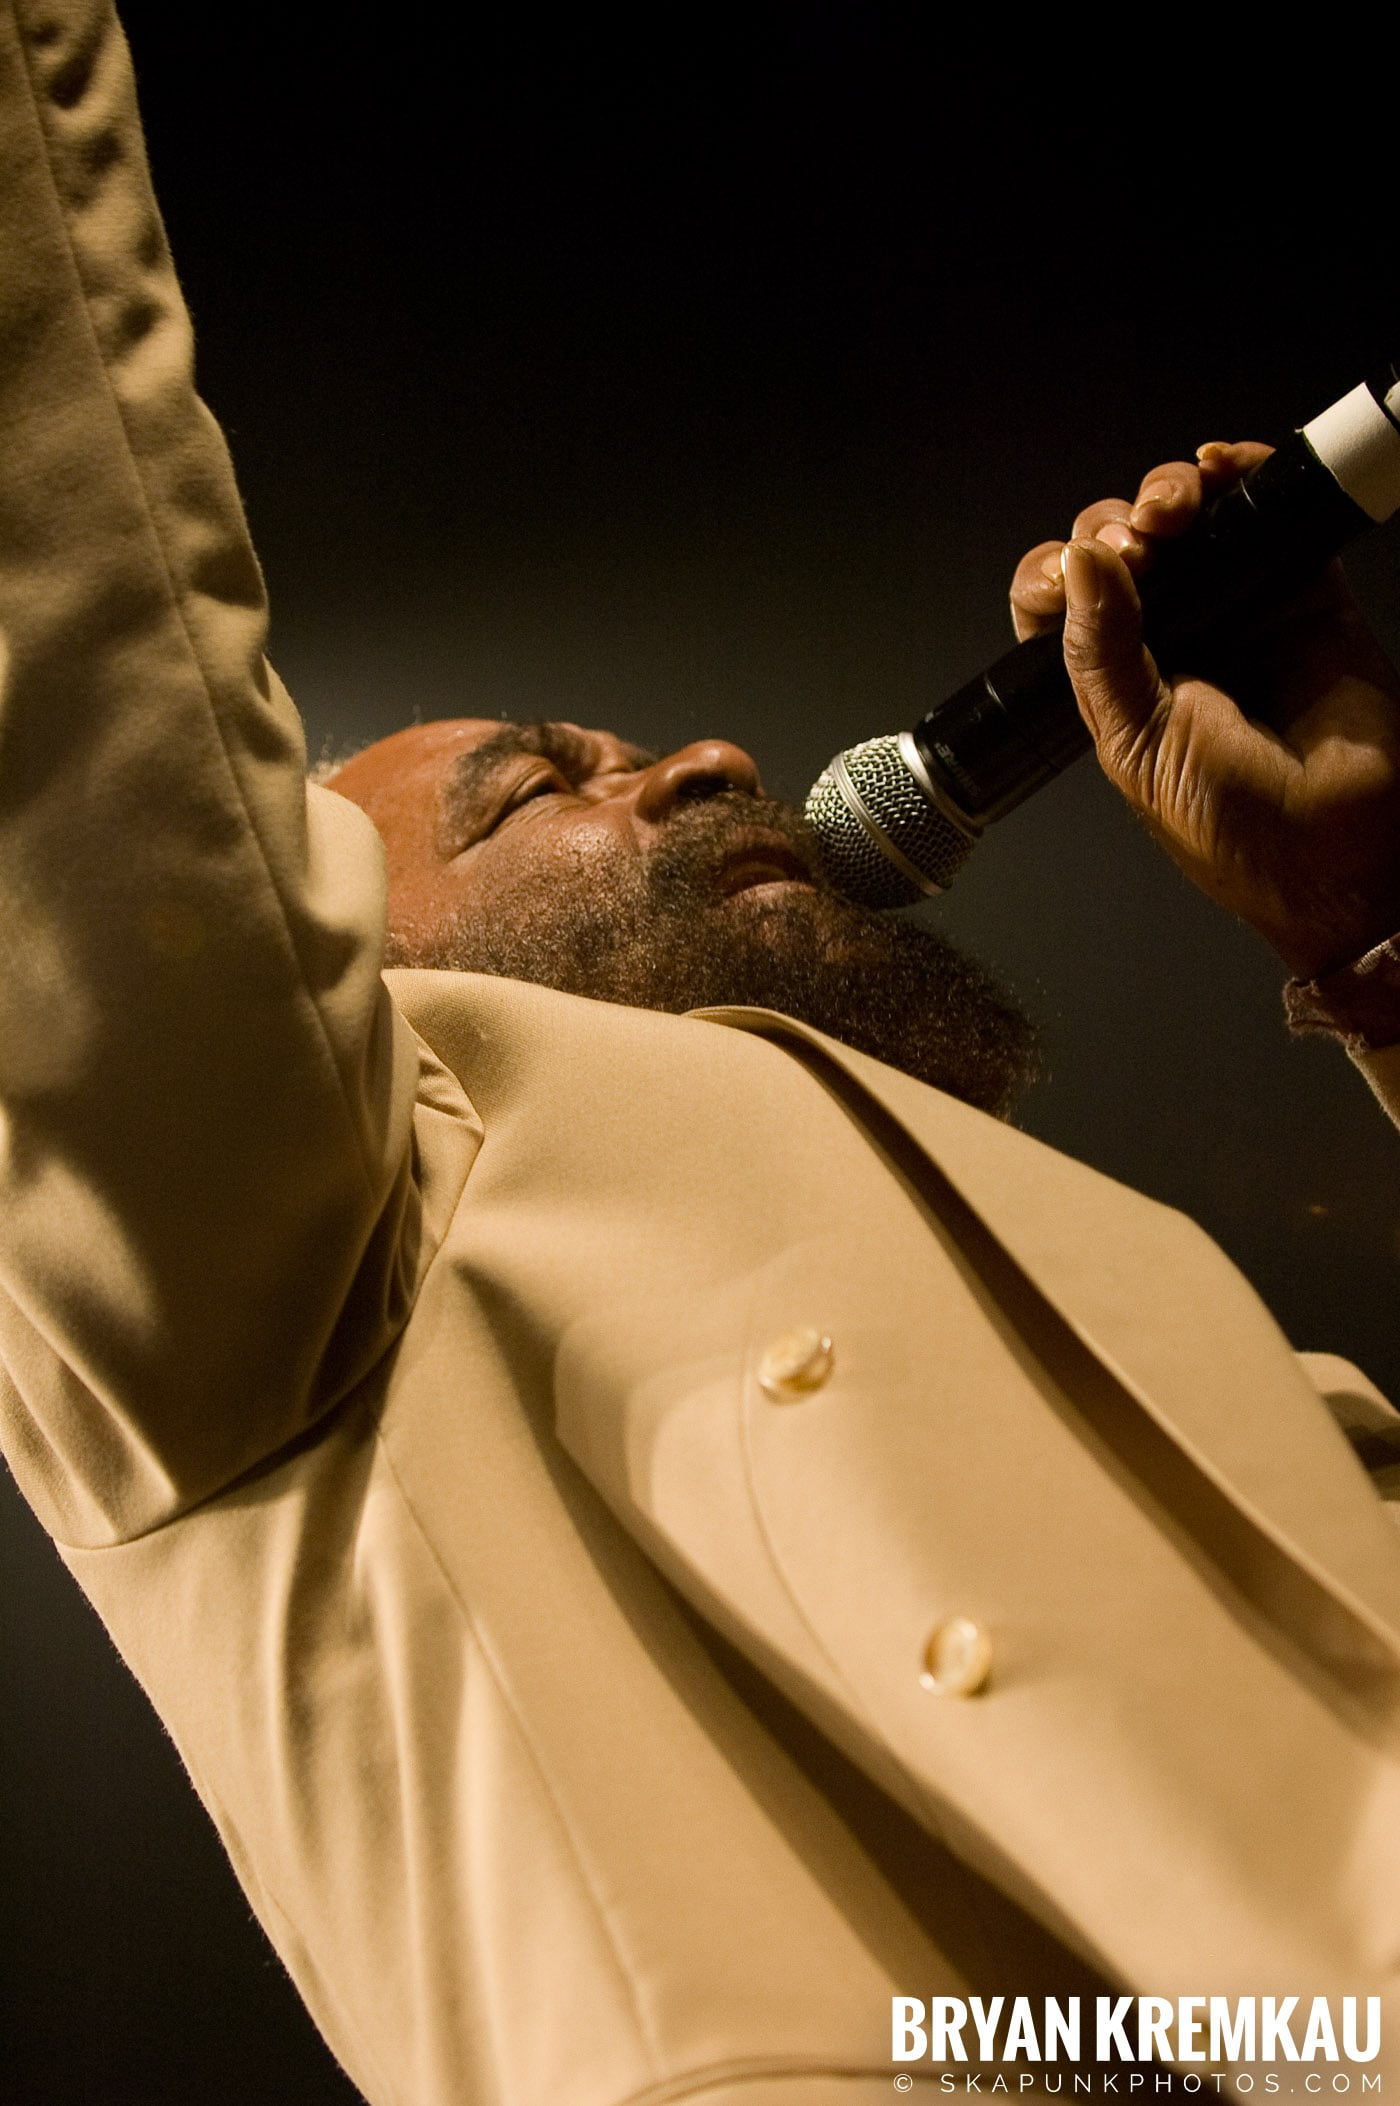 John Holt @ Vintage Reggae Fest - Hammerstein Ballroom, NYC - 12.16.07 (6)